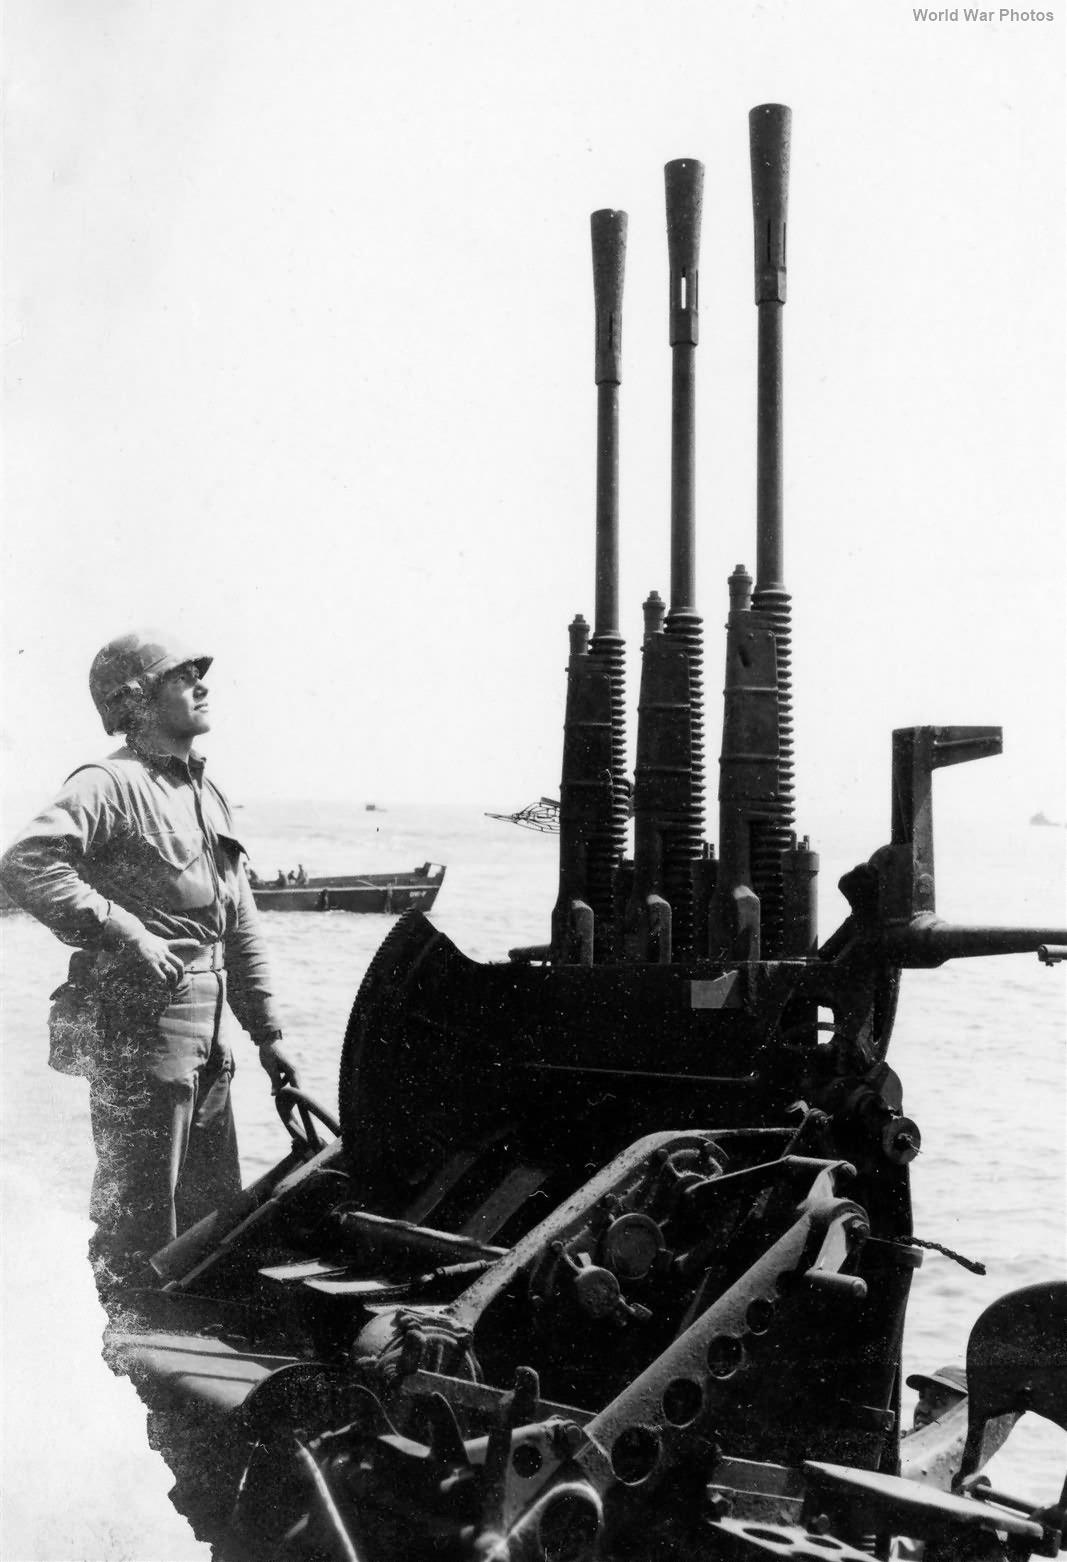 Japanese Triple 25mm AA Gun Mount on wrecked APD